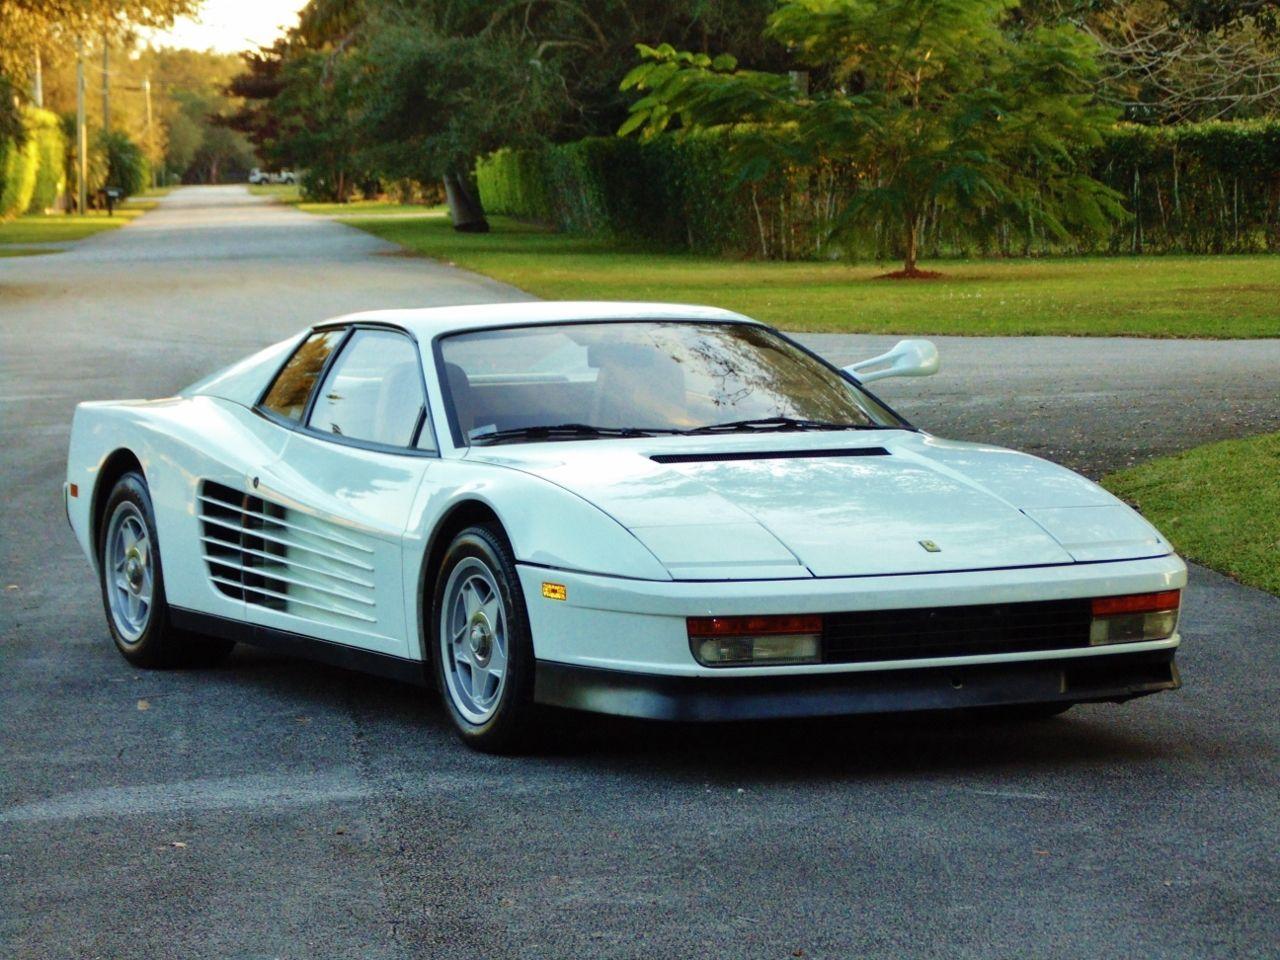 Miami Vice Ferrari Testarossa Cool Substance Pinterest - Sports cars nz for sale